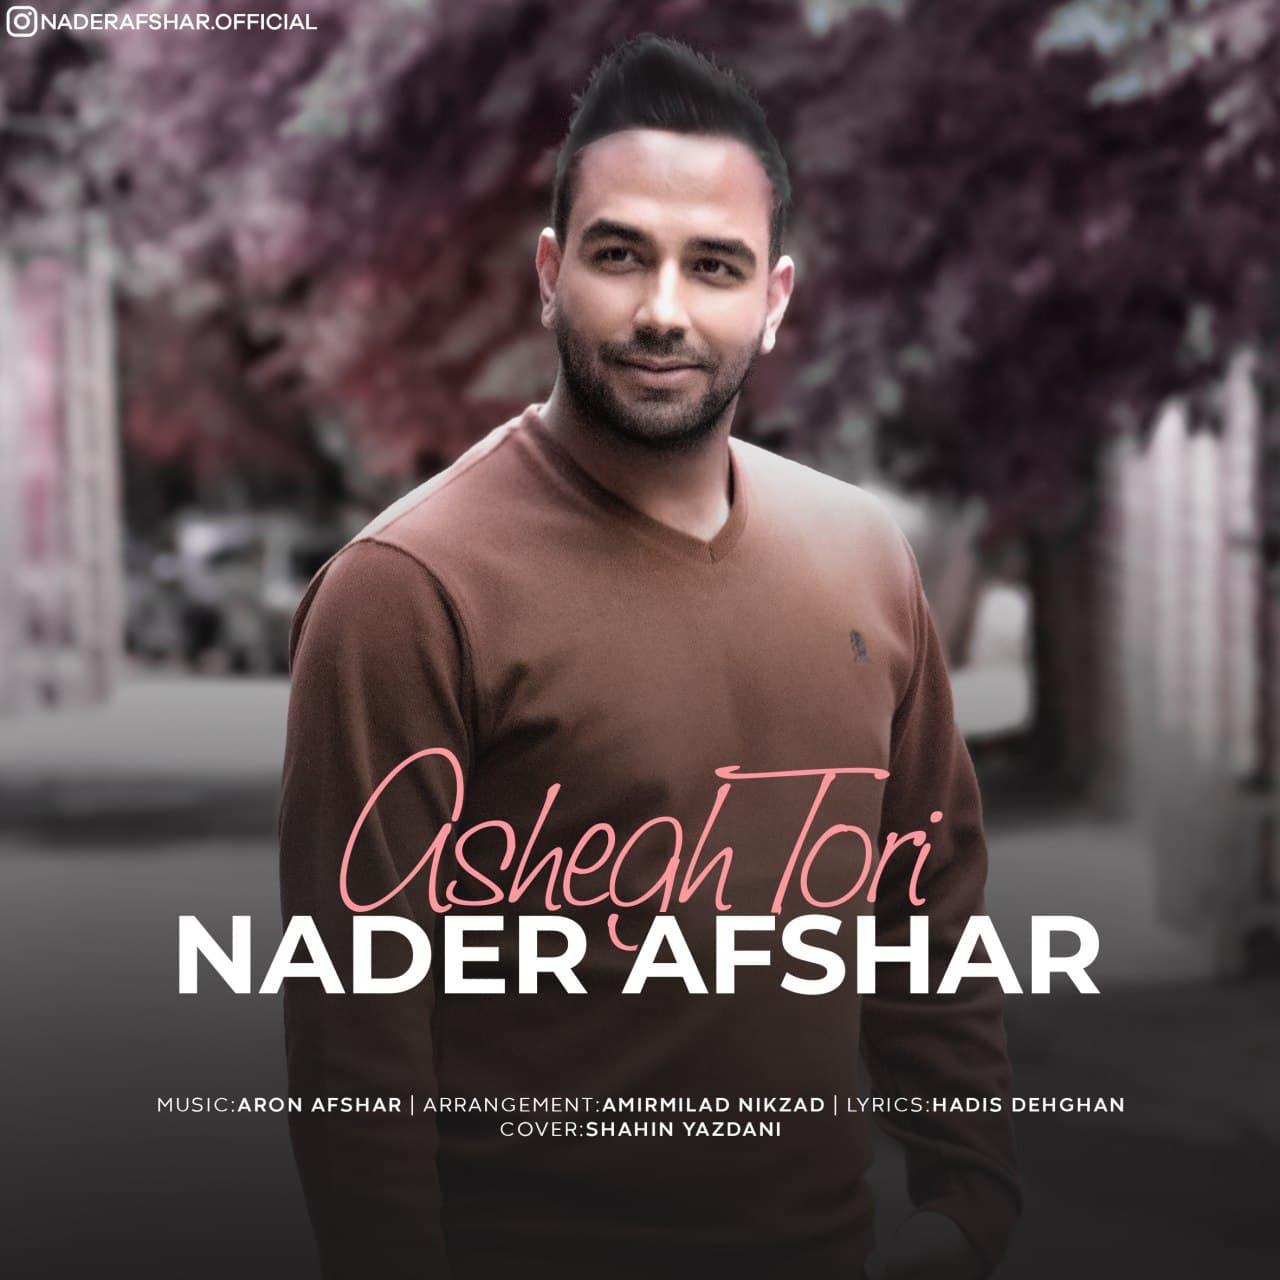 Nader Afshar – Asheghtor